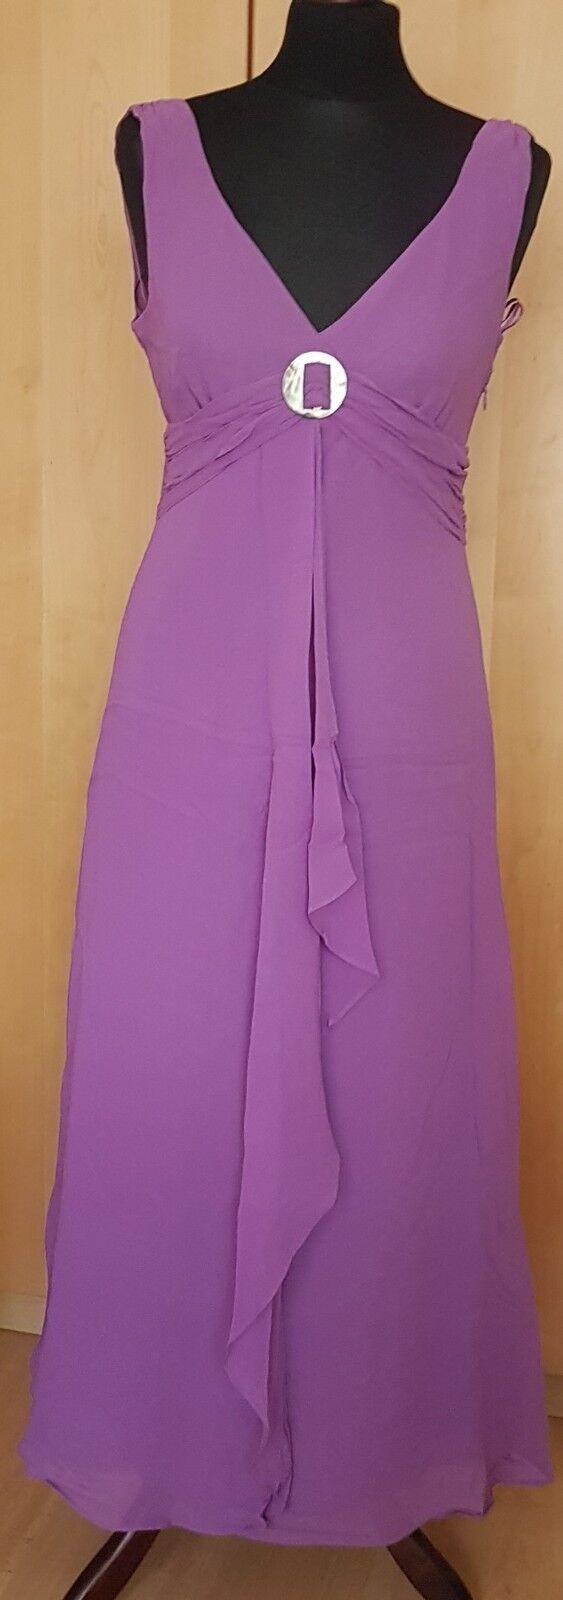 BNWT Kaliko 100% soie violets lavande nacre Cascade Robe UK 10